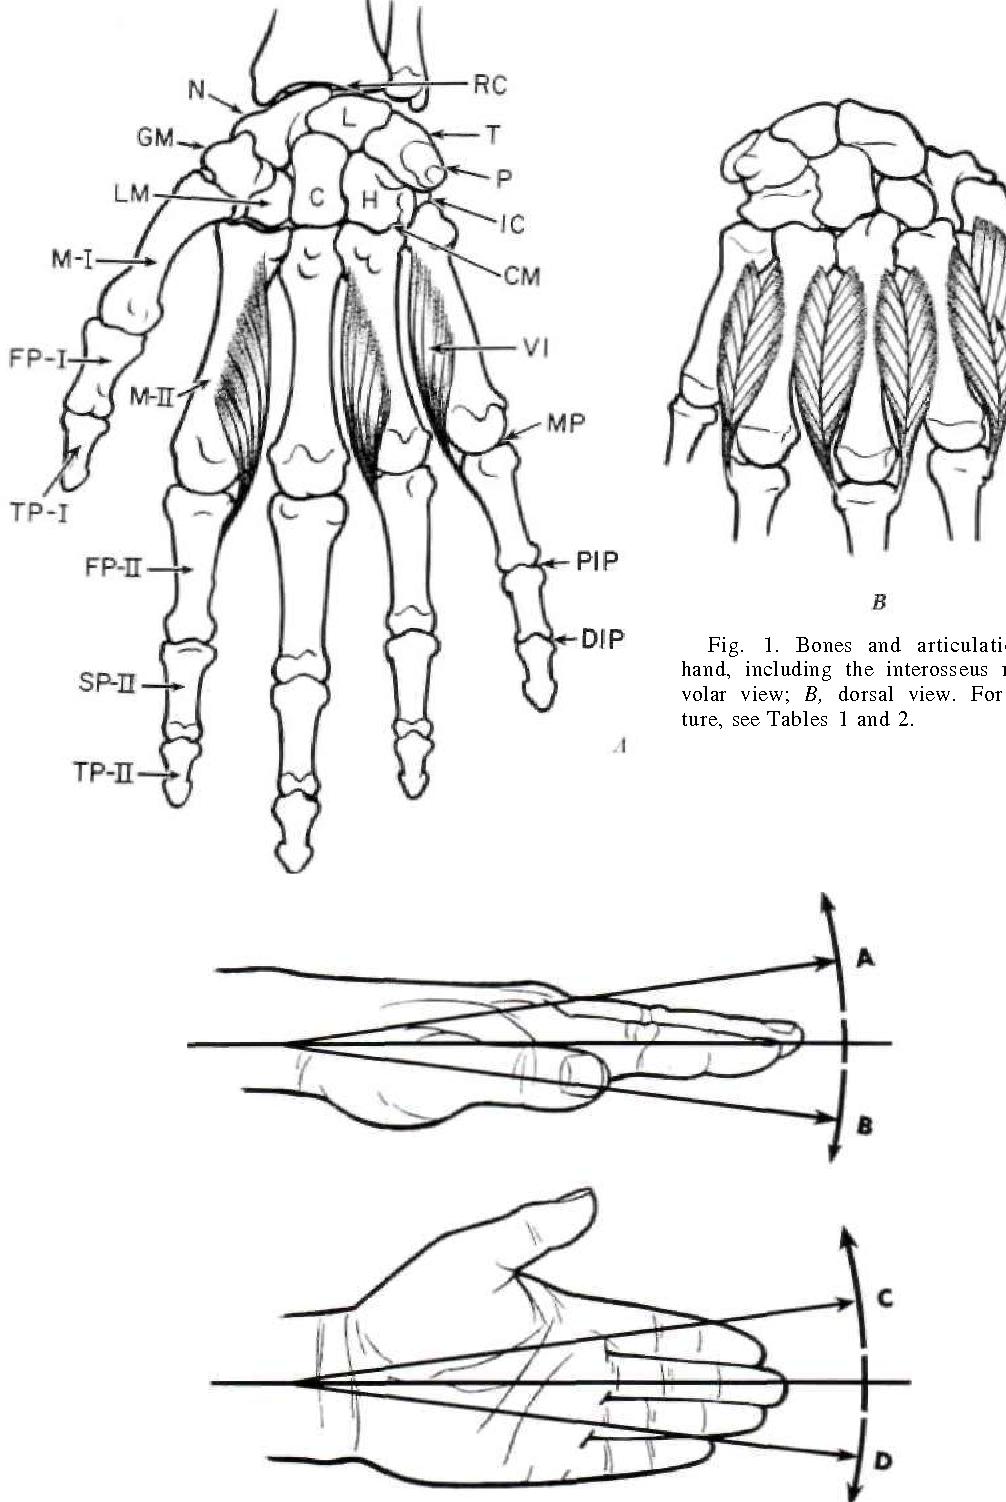 The Anatomy And Mechanics Of The Human Hand Semantic Scholar